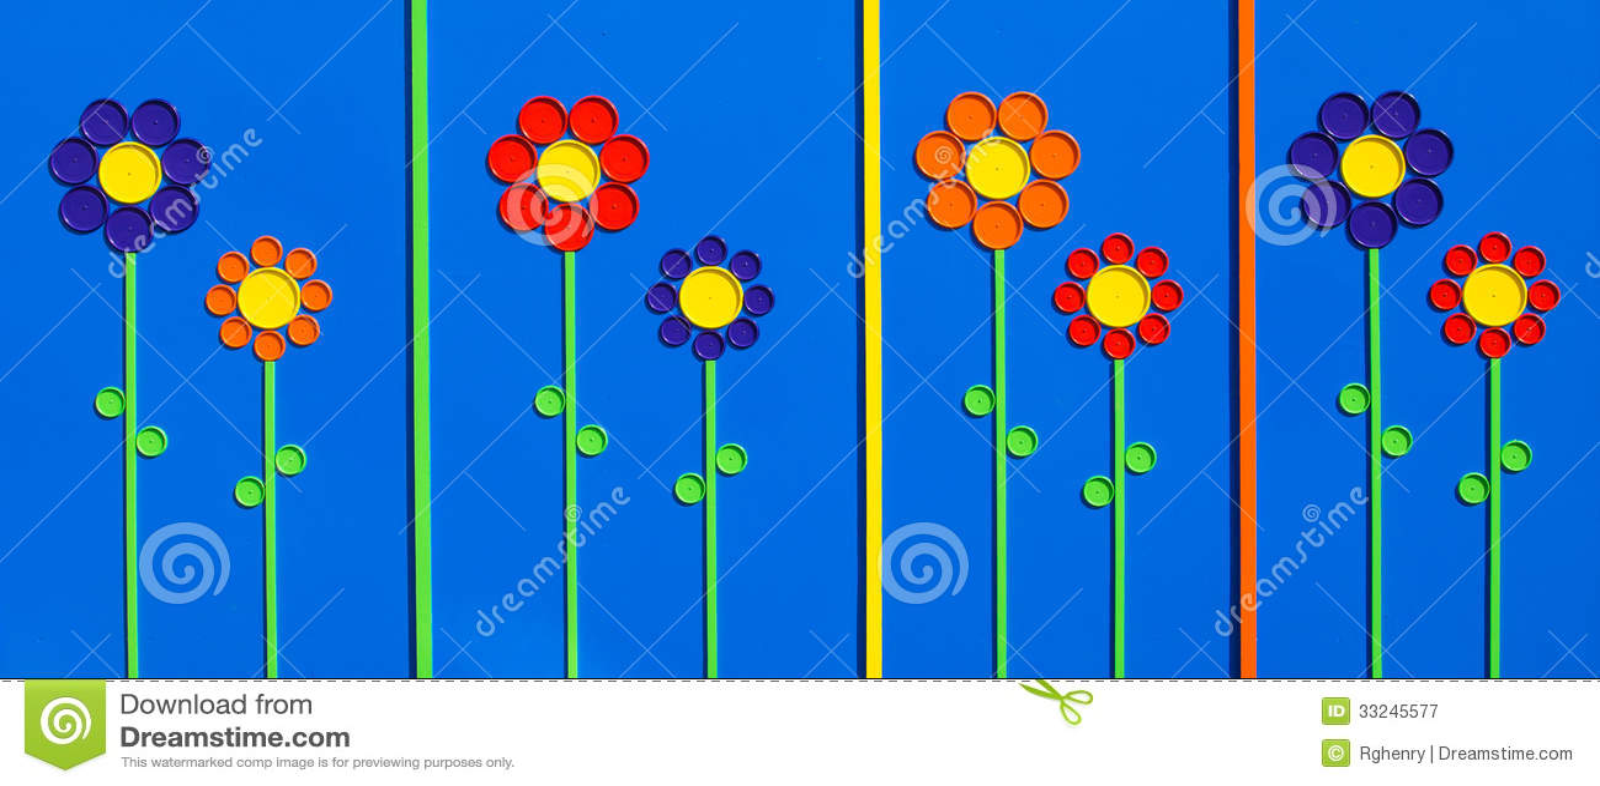 Flower Lids